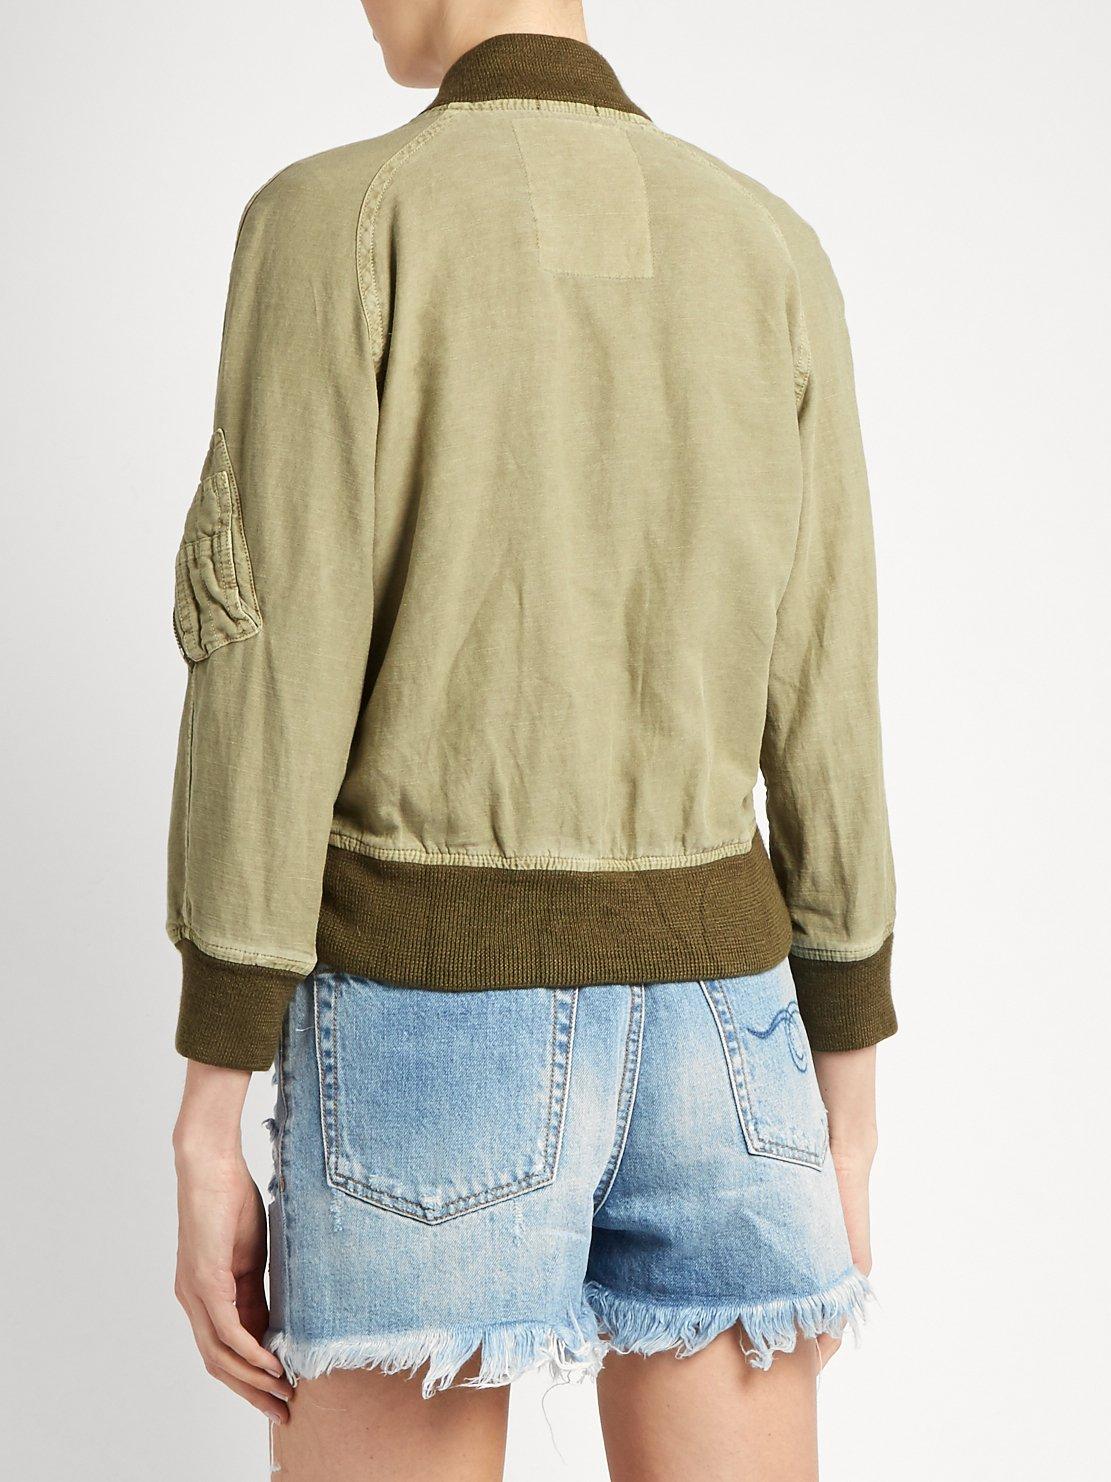 Shrunken-fit cotton-blend flight jacket by R13